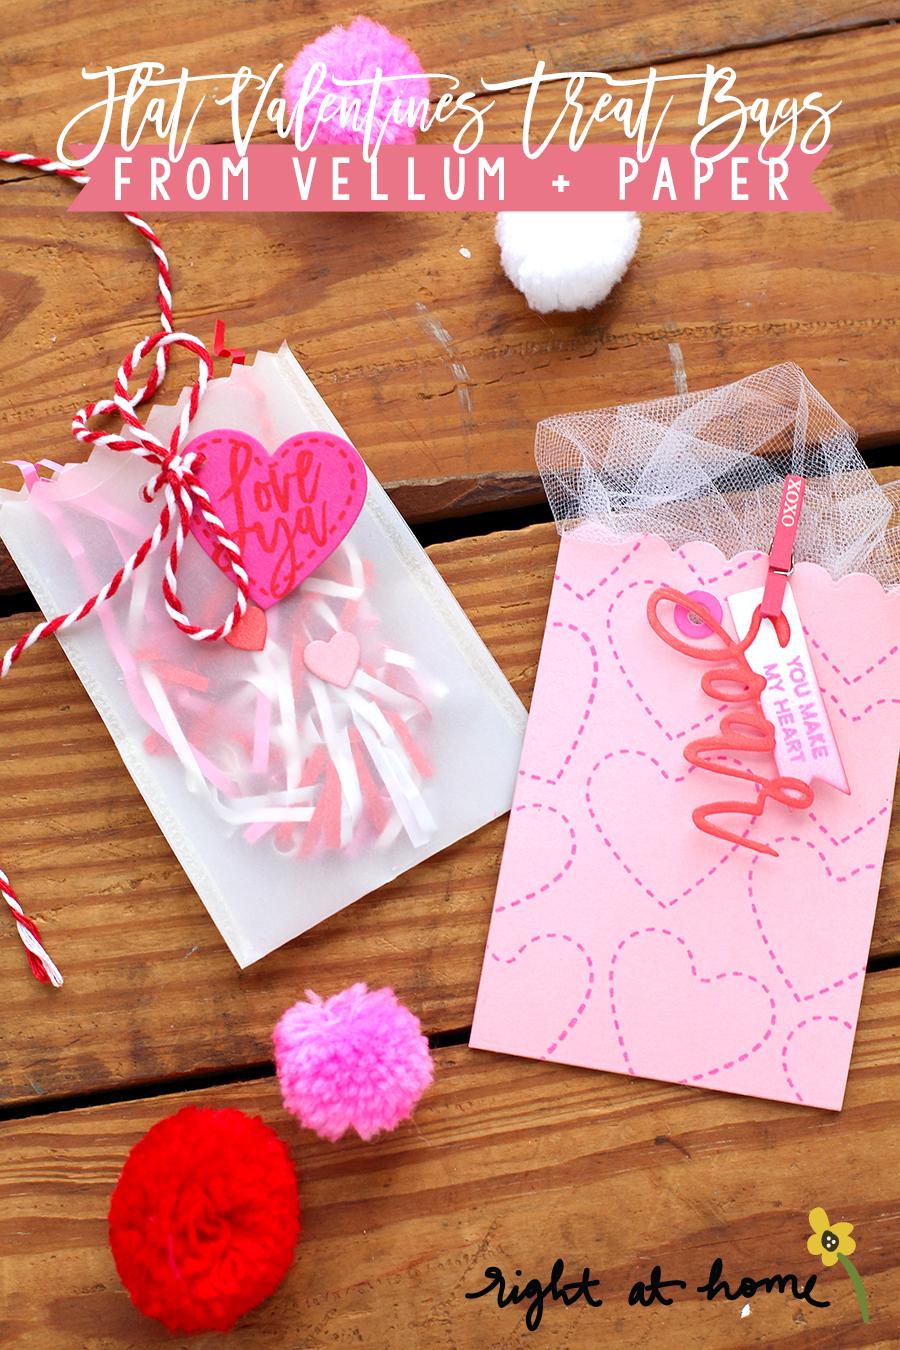 Day #8: Flat Vellum + Paper Valentines Treat Bags // rightathomeshop.com/blog